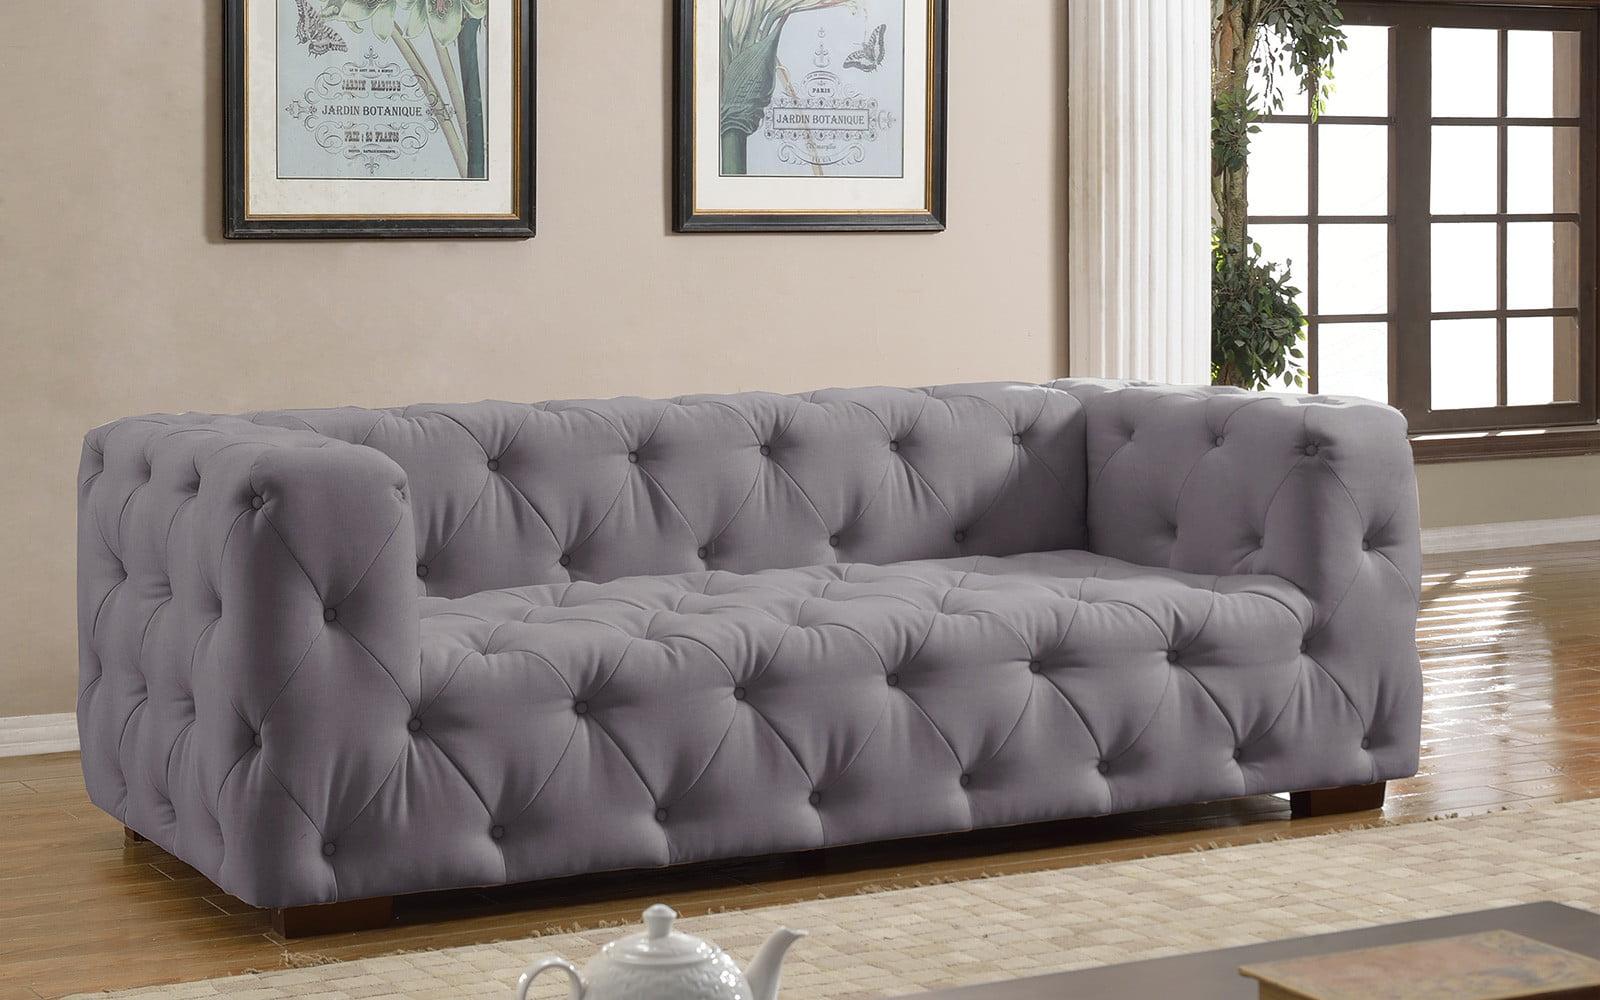 Luxurious Modern Large Tufted Linen Fabric Sofa   Walmart.com